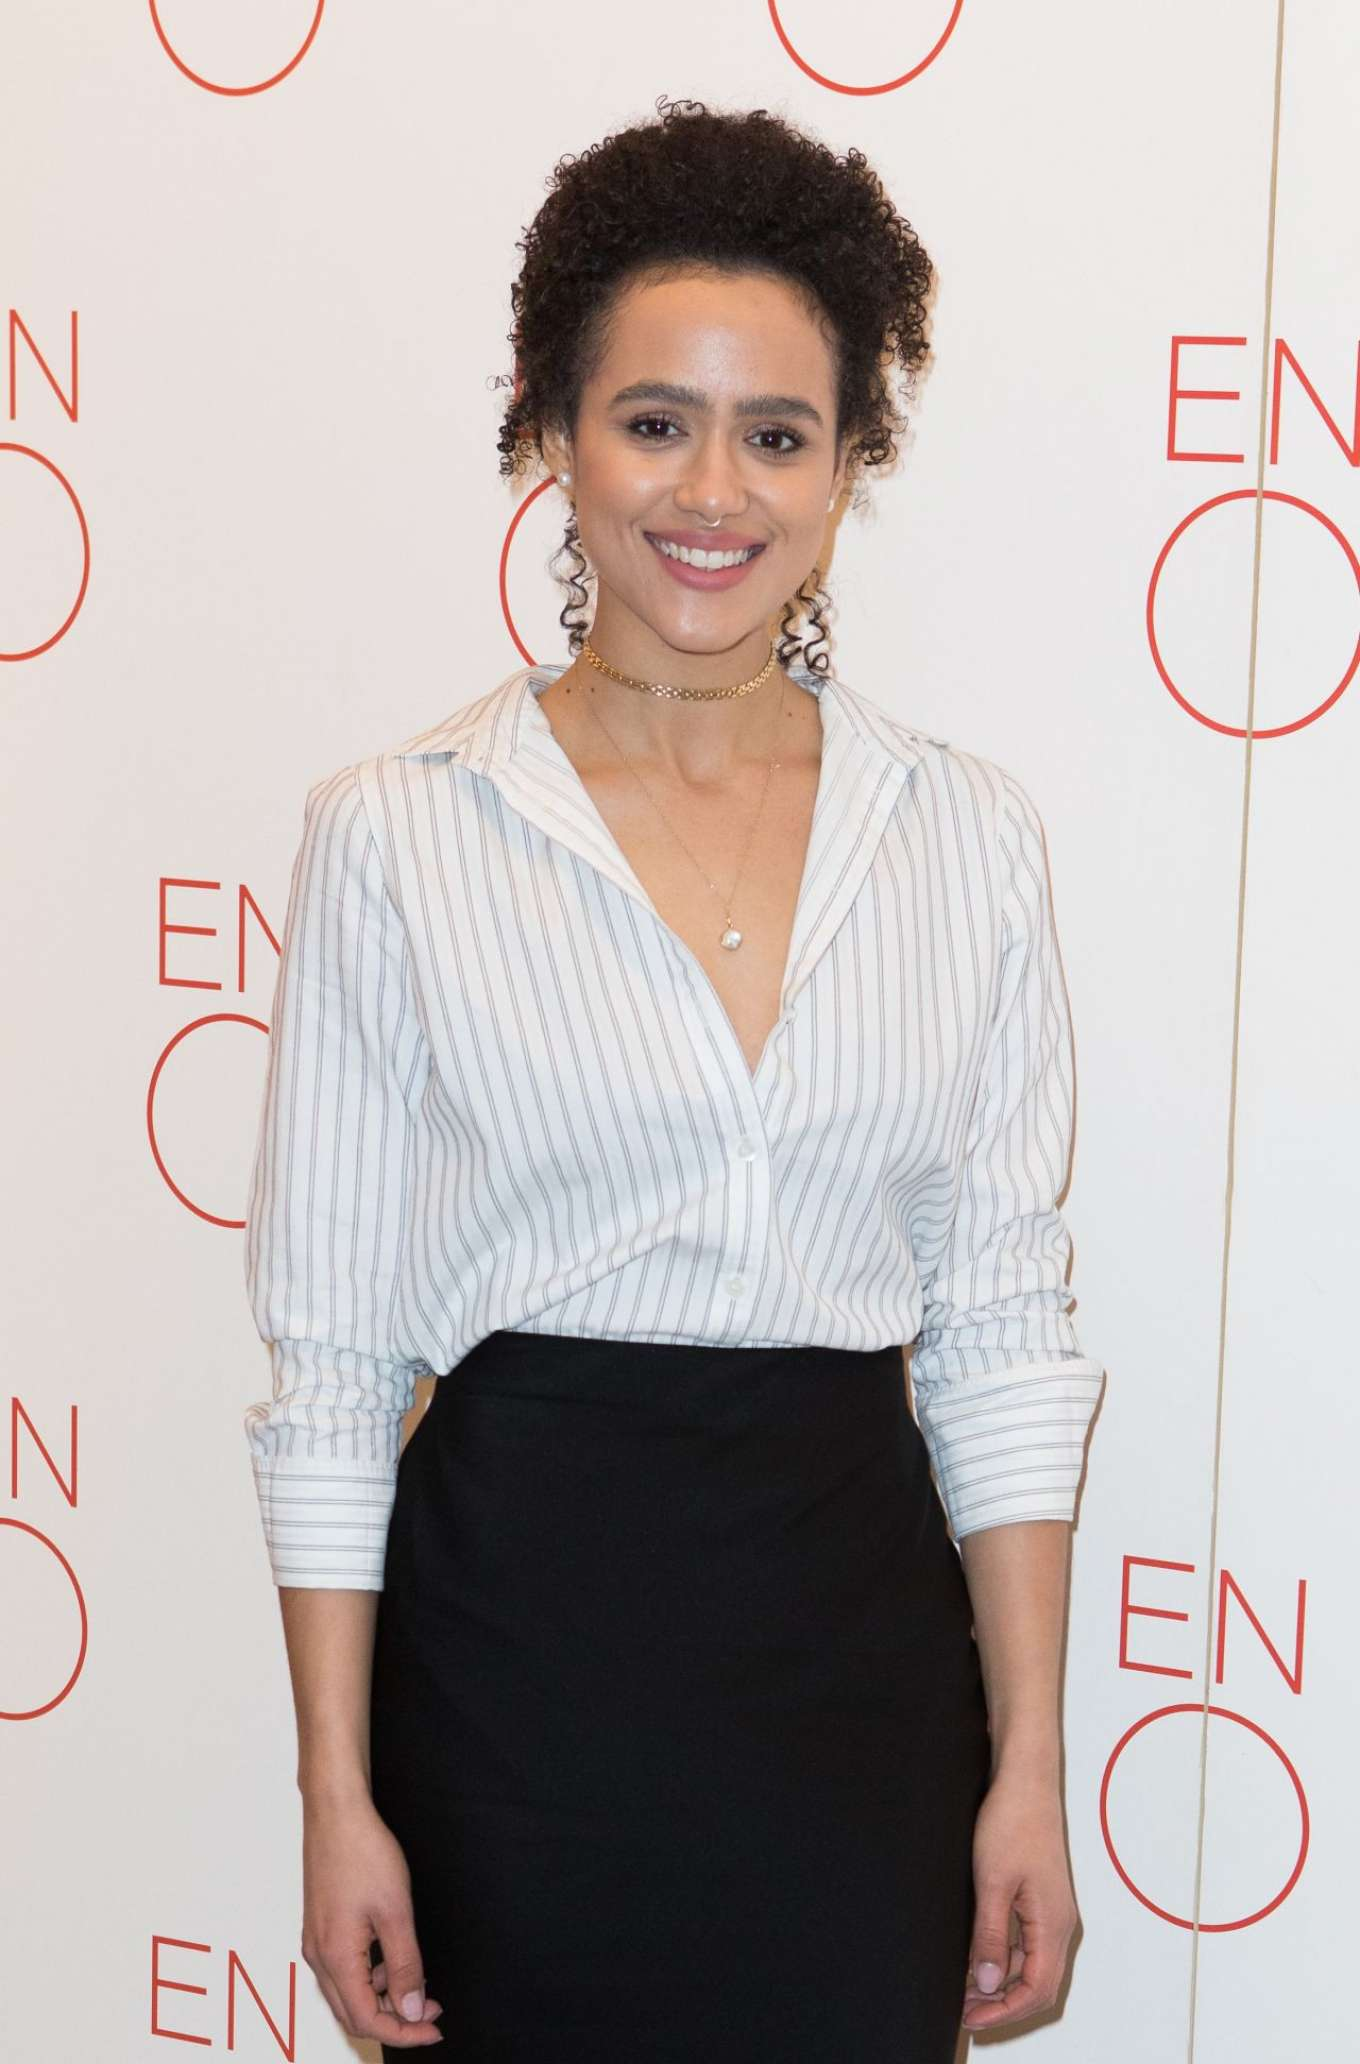 Nathalie Emmanuel - 'La Traviata' VIP Performance and Press Night in London